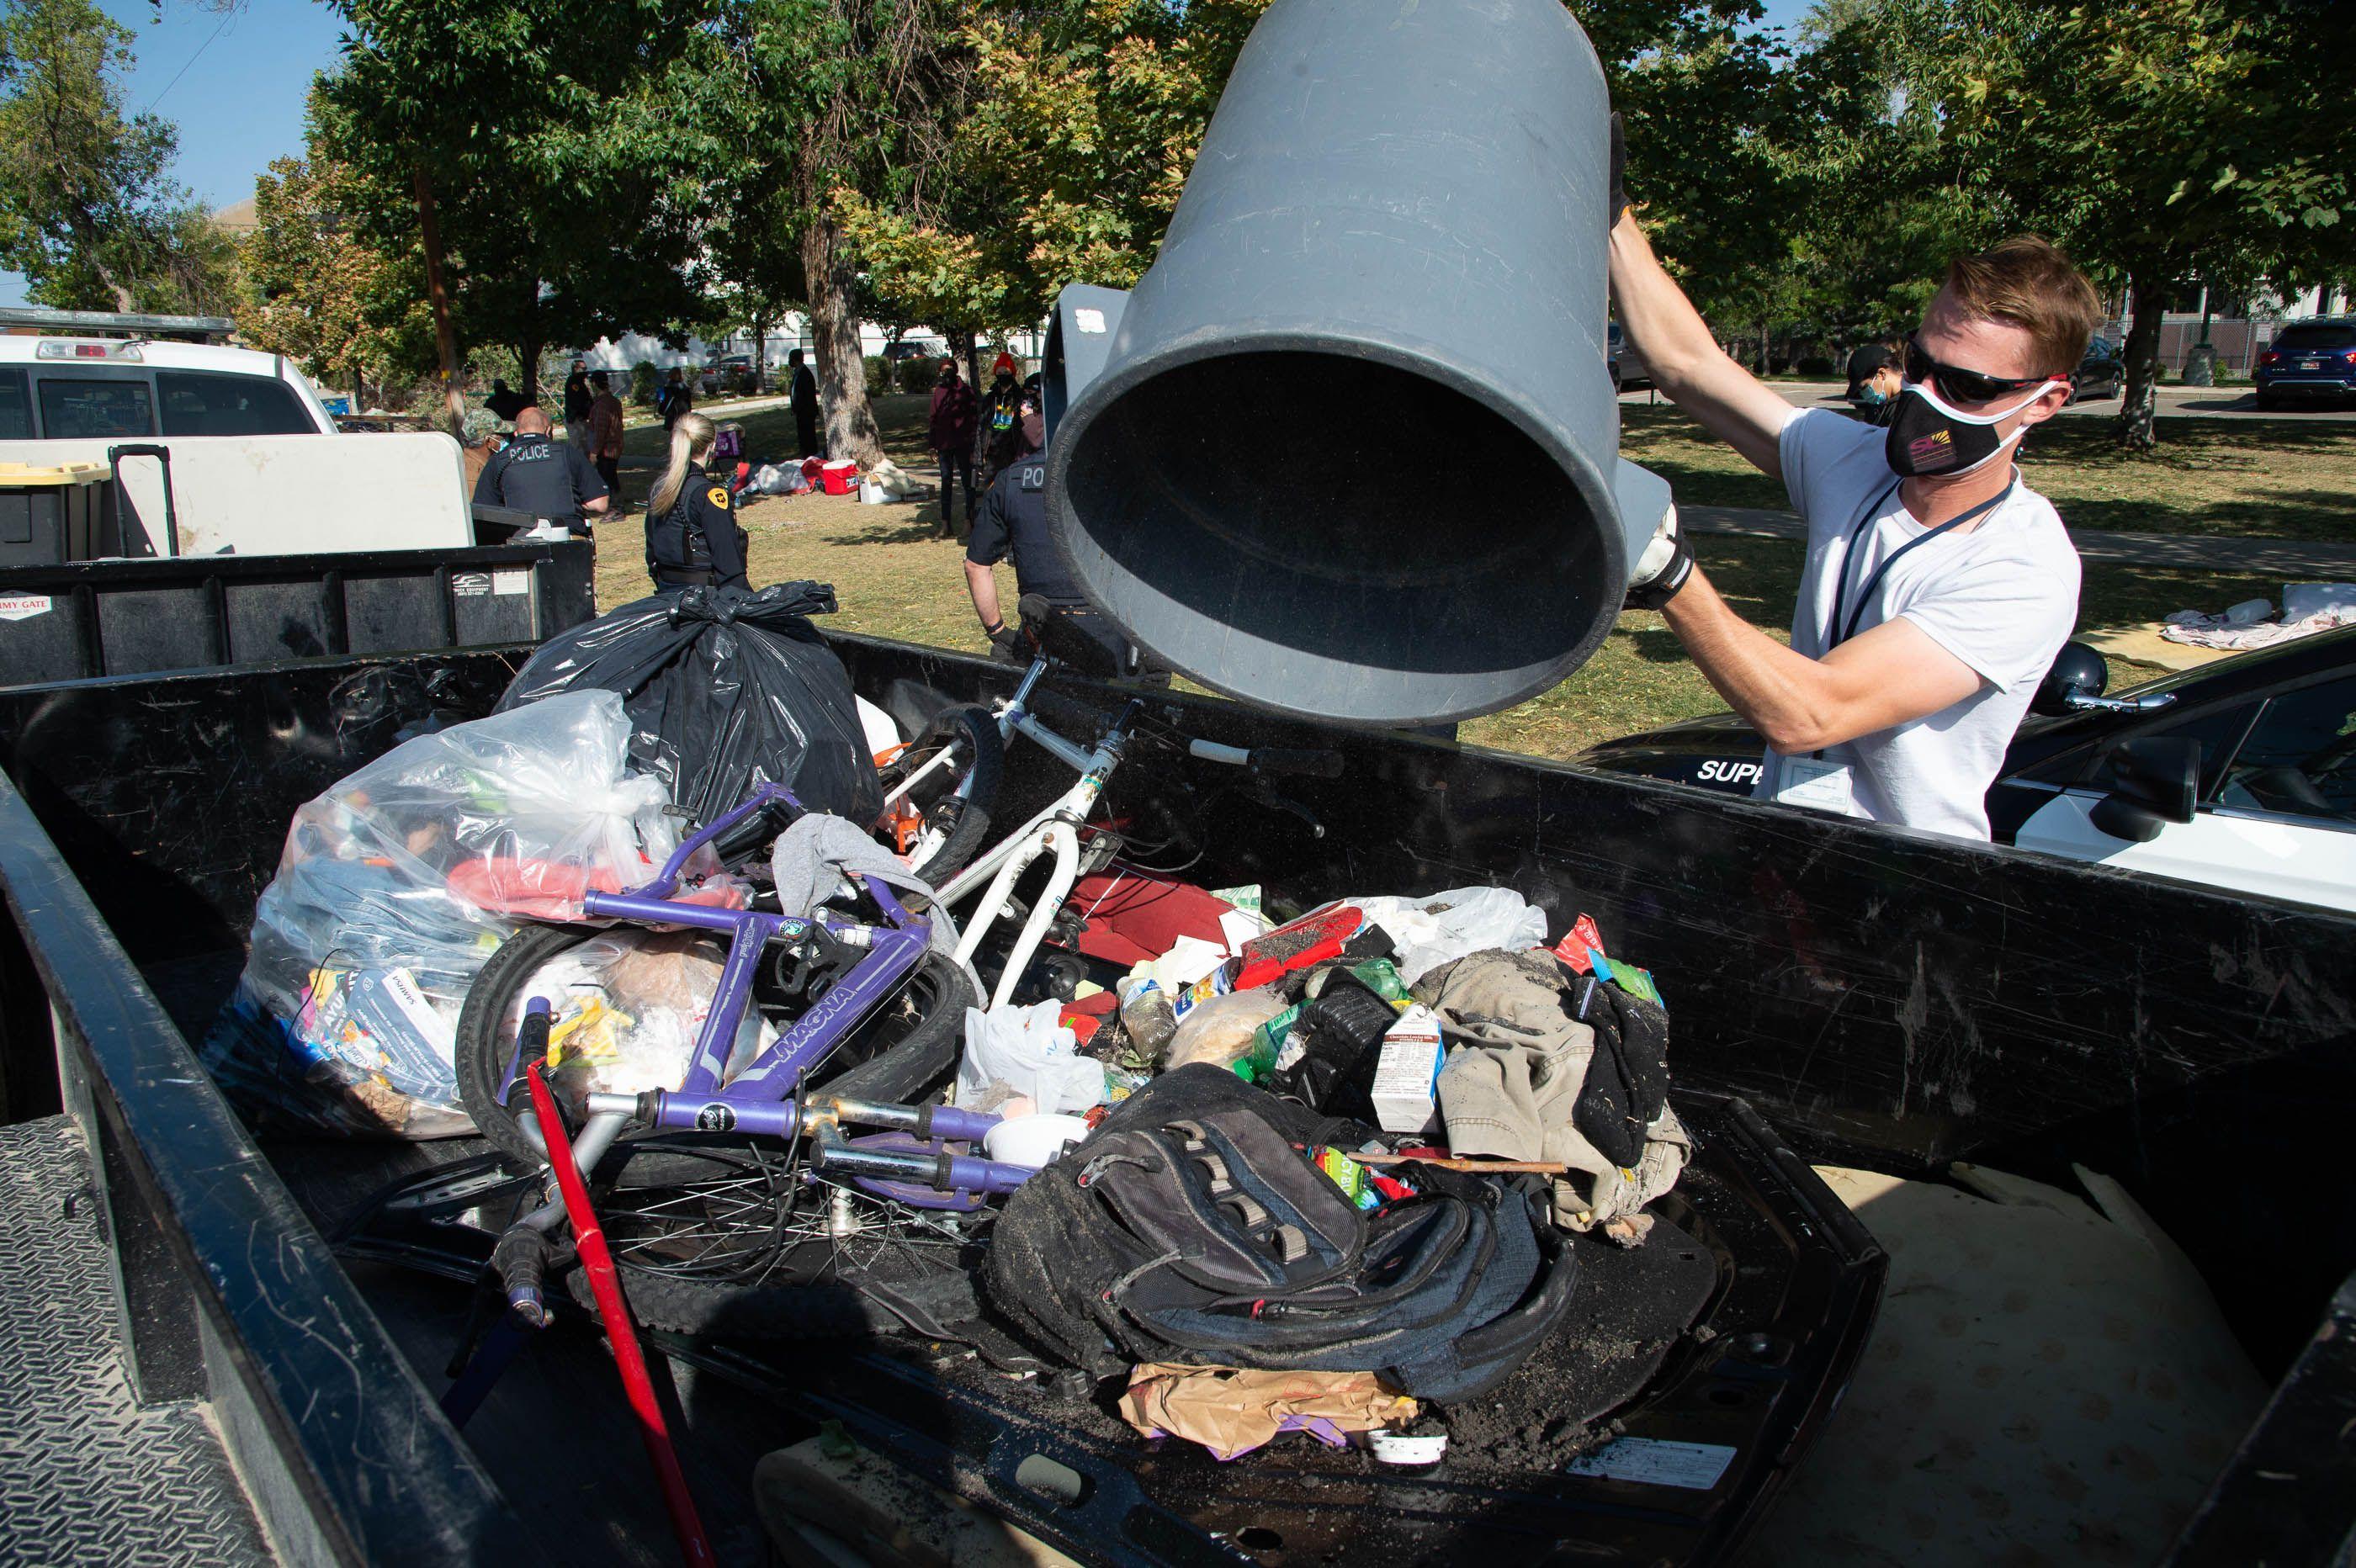 (Francisco Kjolseth  |  The Salt Lake Tribune) The Salt Lake County Health Department forces a clean up of homeless camps set up near Taufer Park in Salt Lake City on Thursday, Sept. 10, 2020.